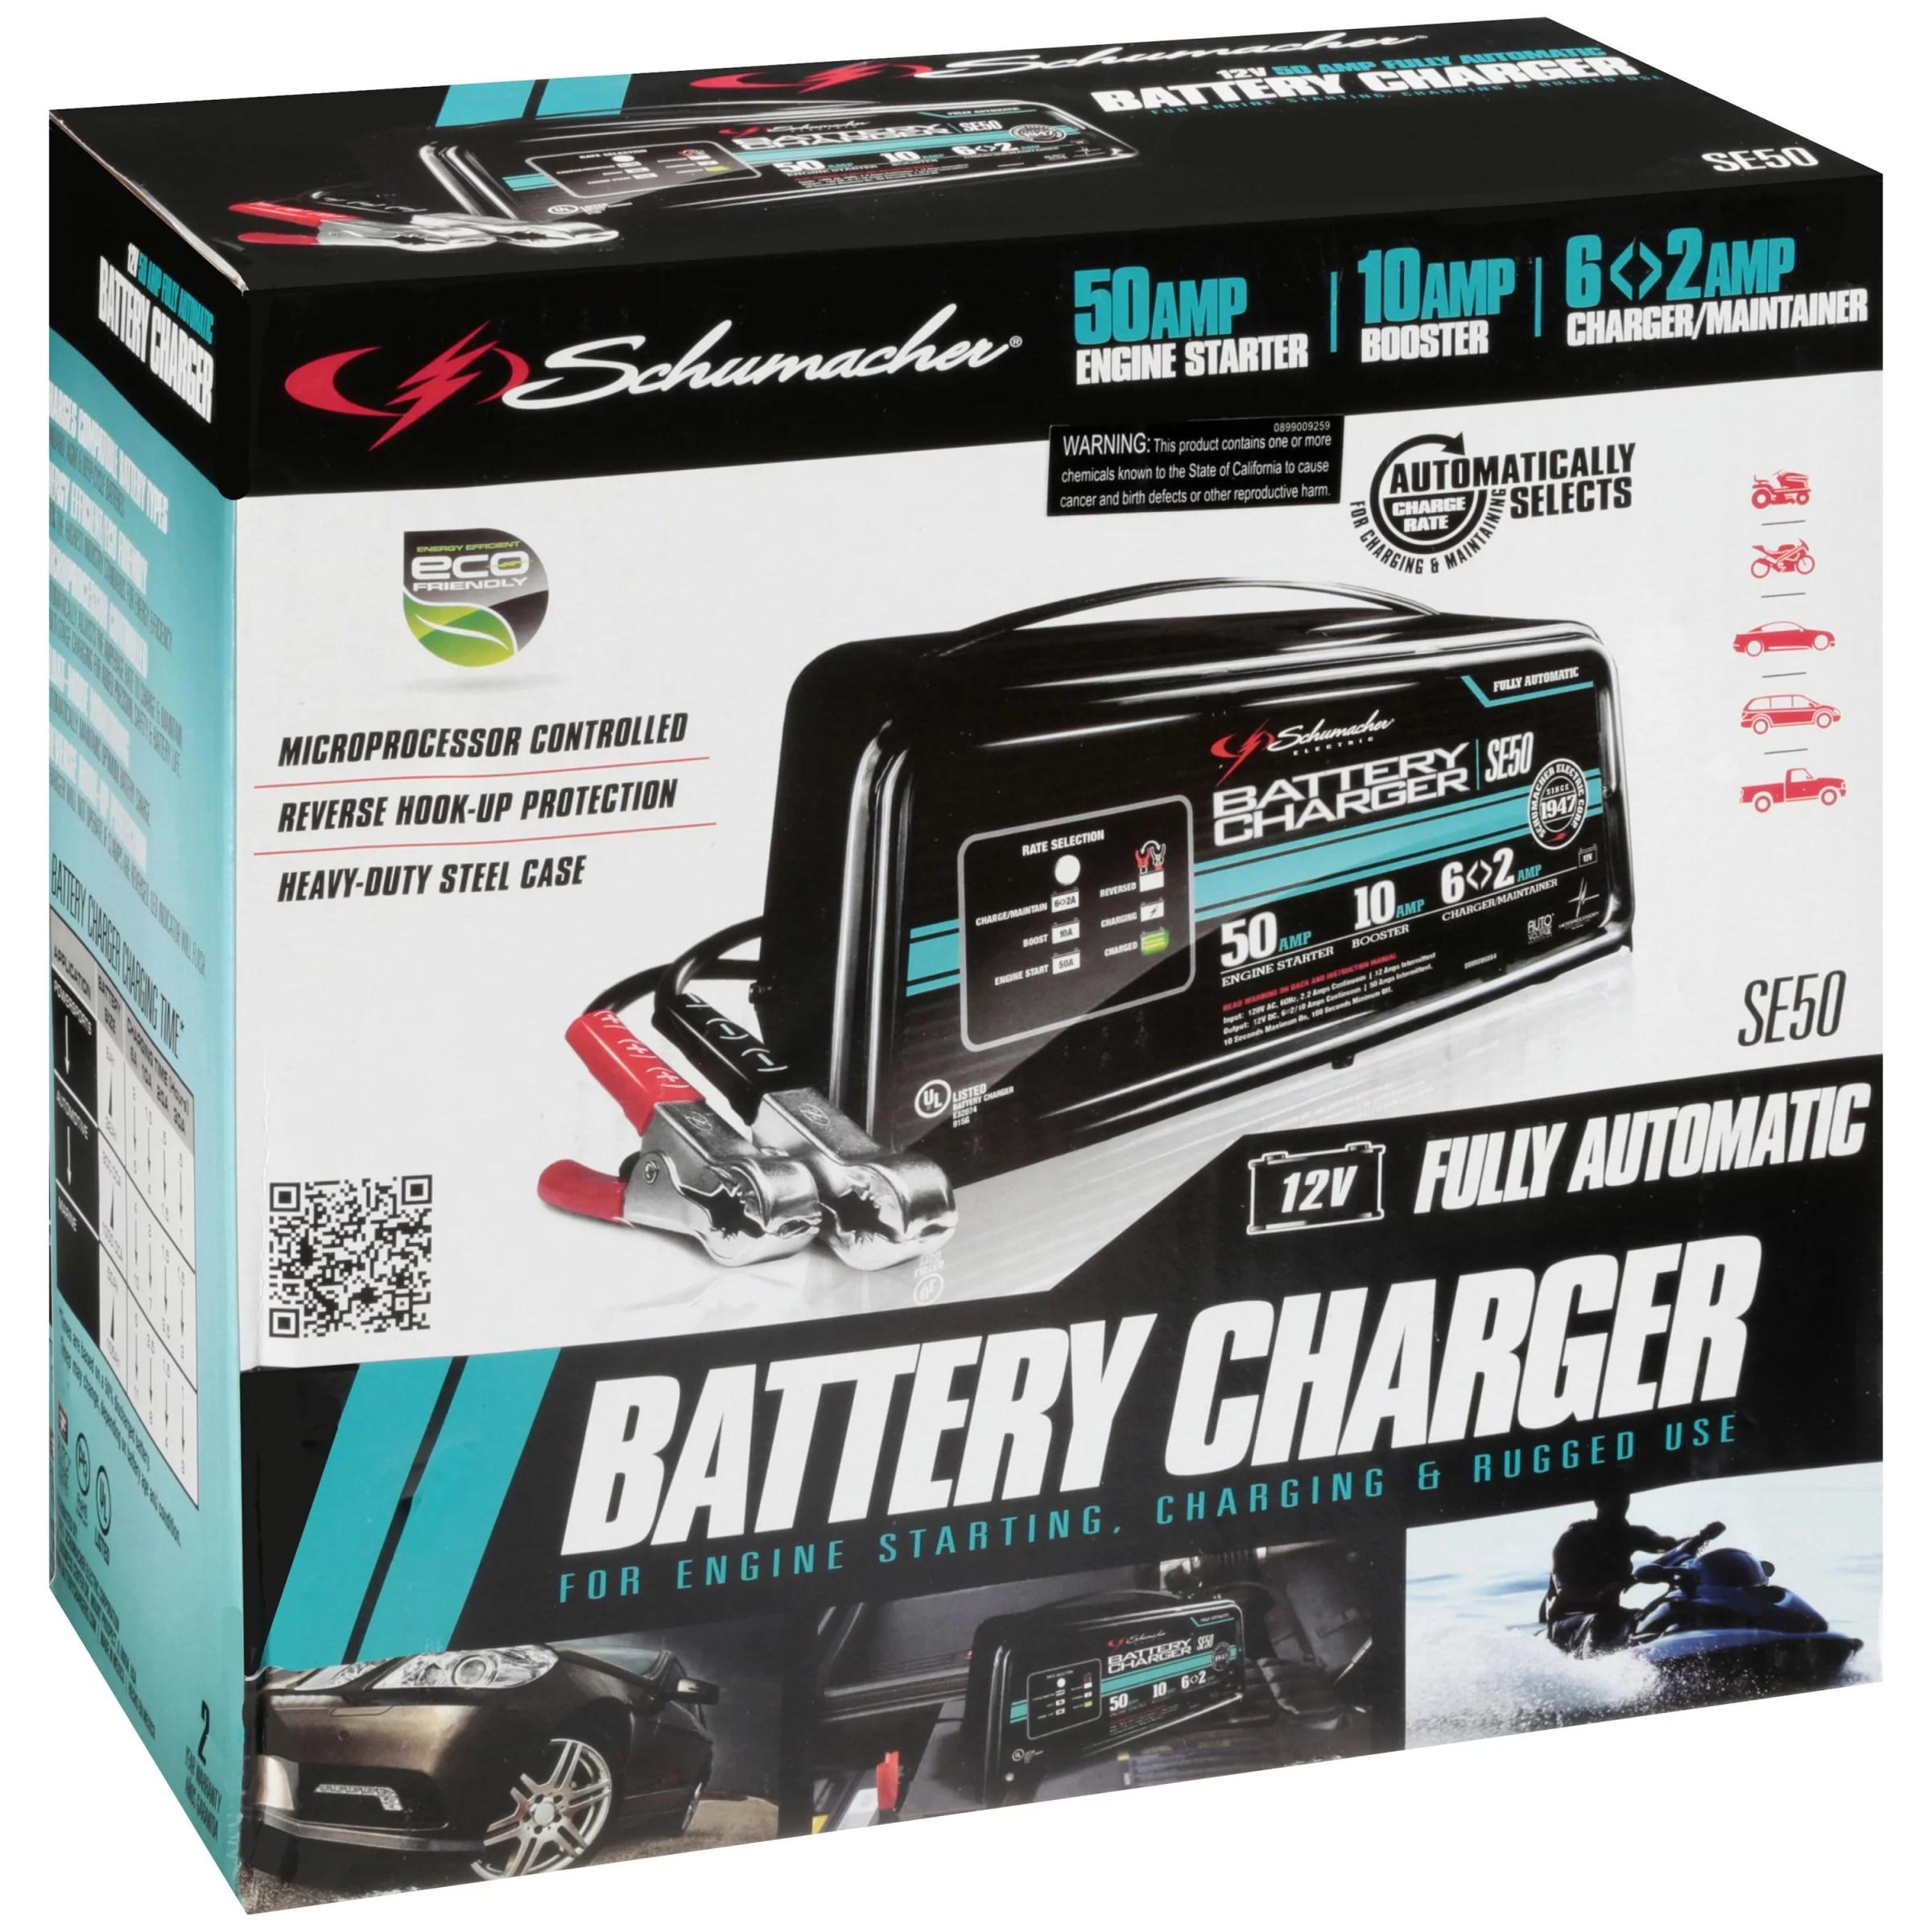 small resolution of schumacher se50 12v fully automatic battery charger walmart comschumacher se50 12v fully automatic battery